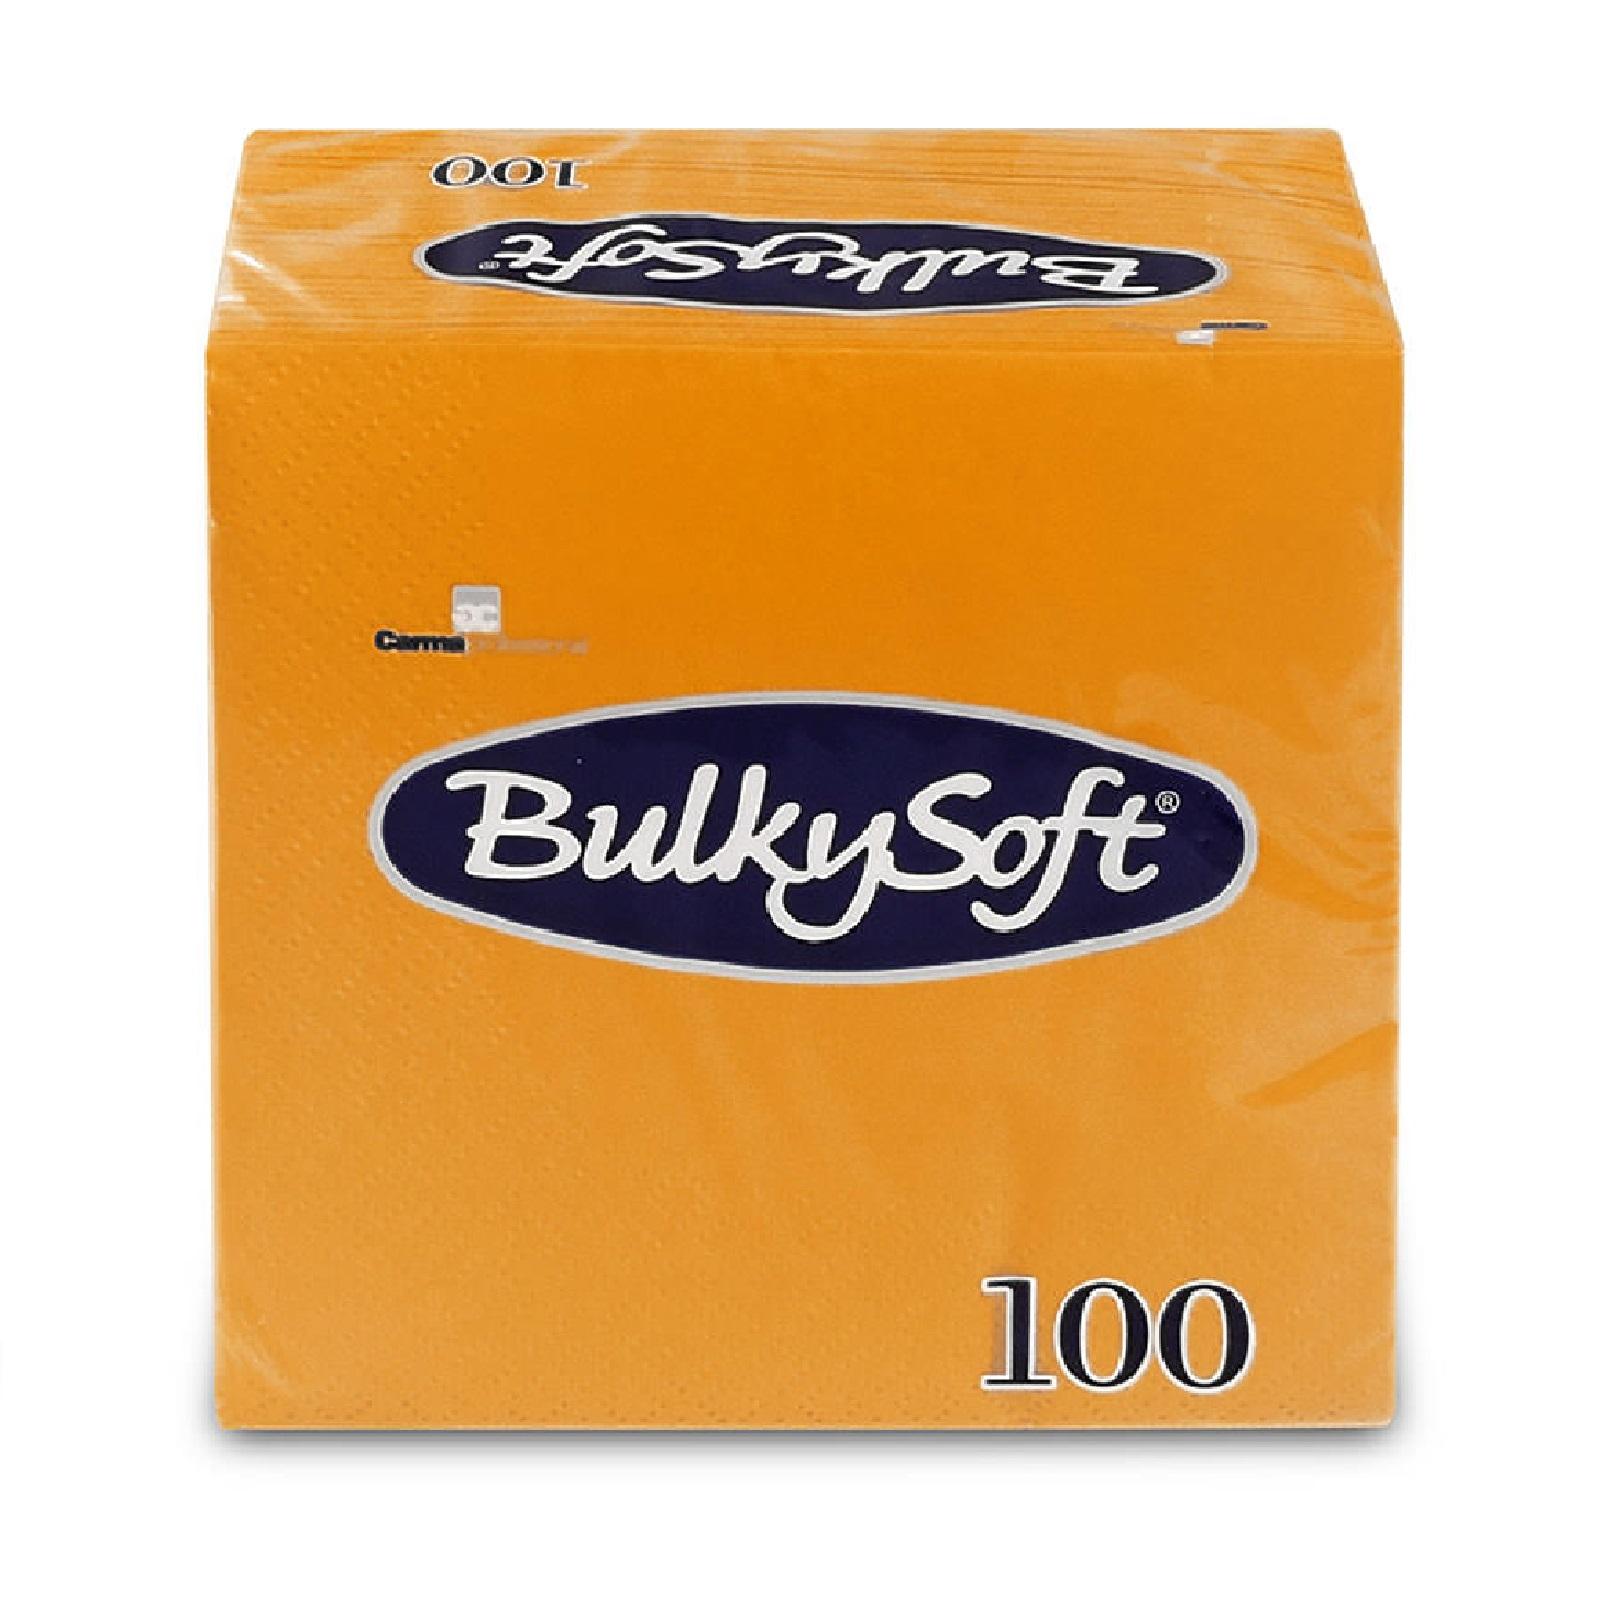 BulkySoft Servietten 1/4 Falz, orange 2-lg, Zell. 24 x 24 cm, 30 x 100 Stk.